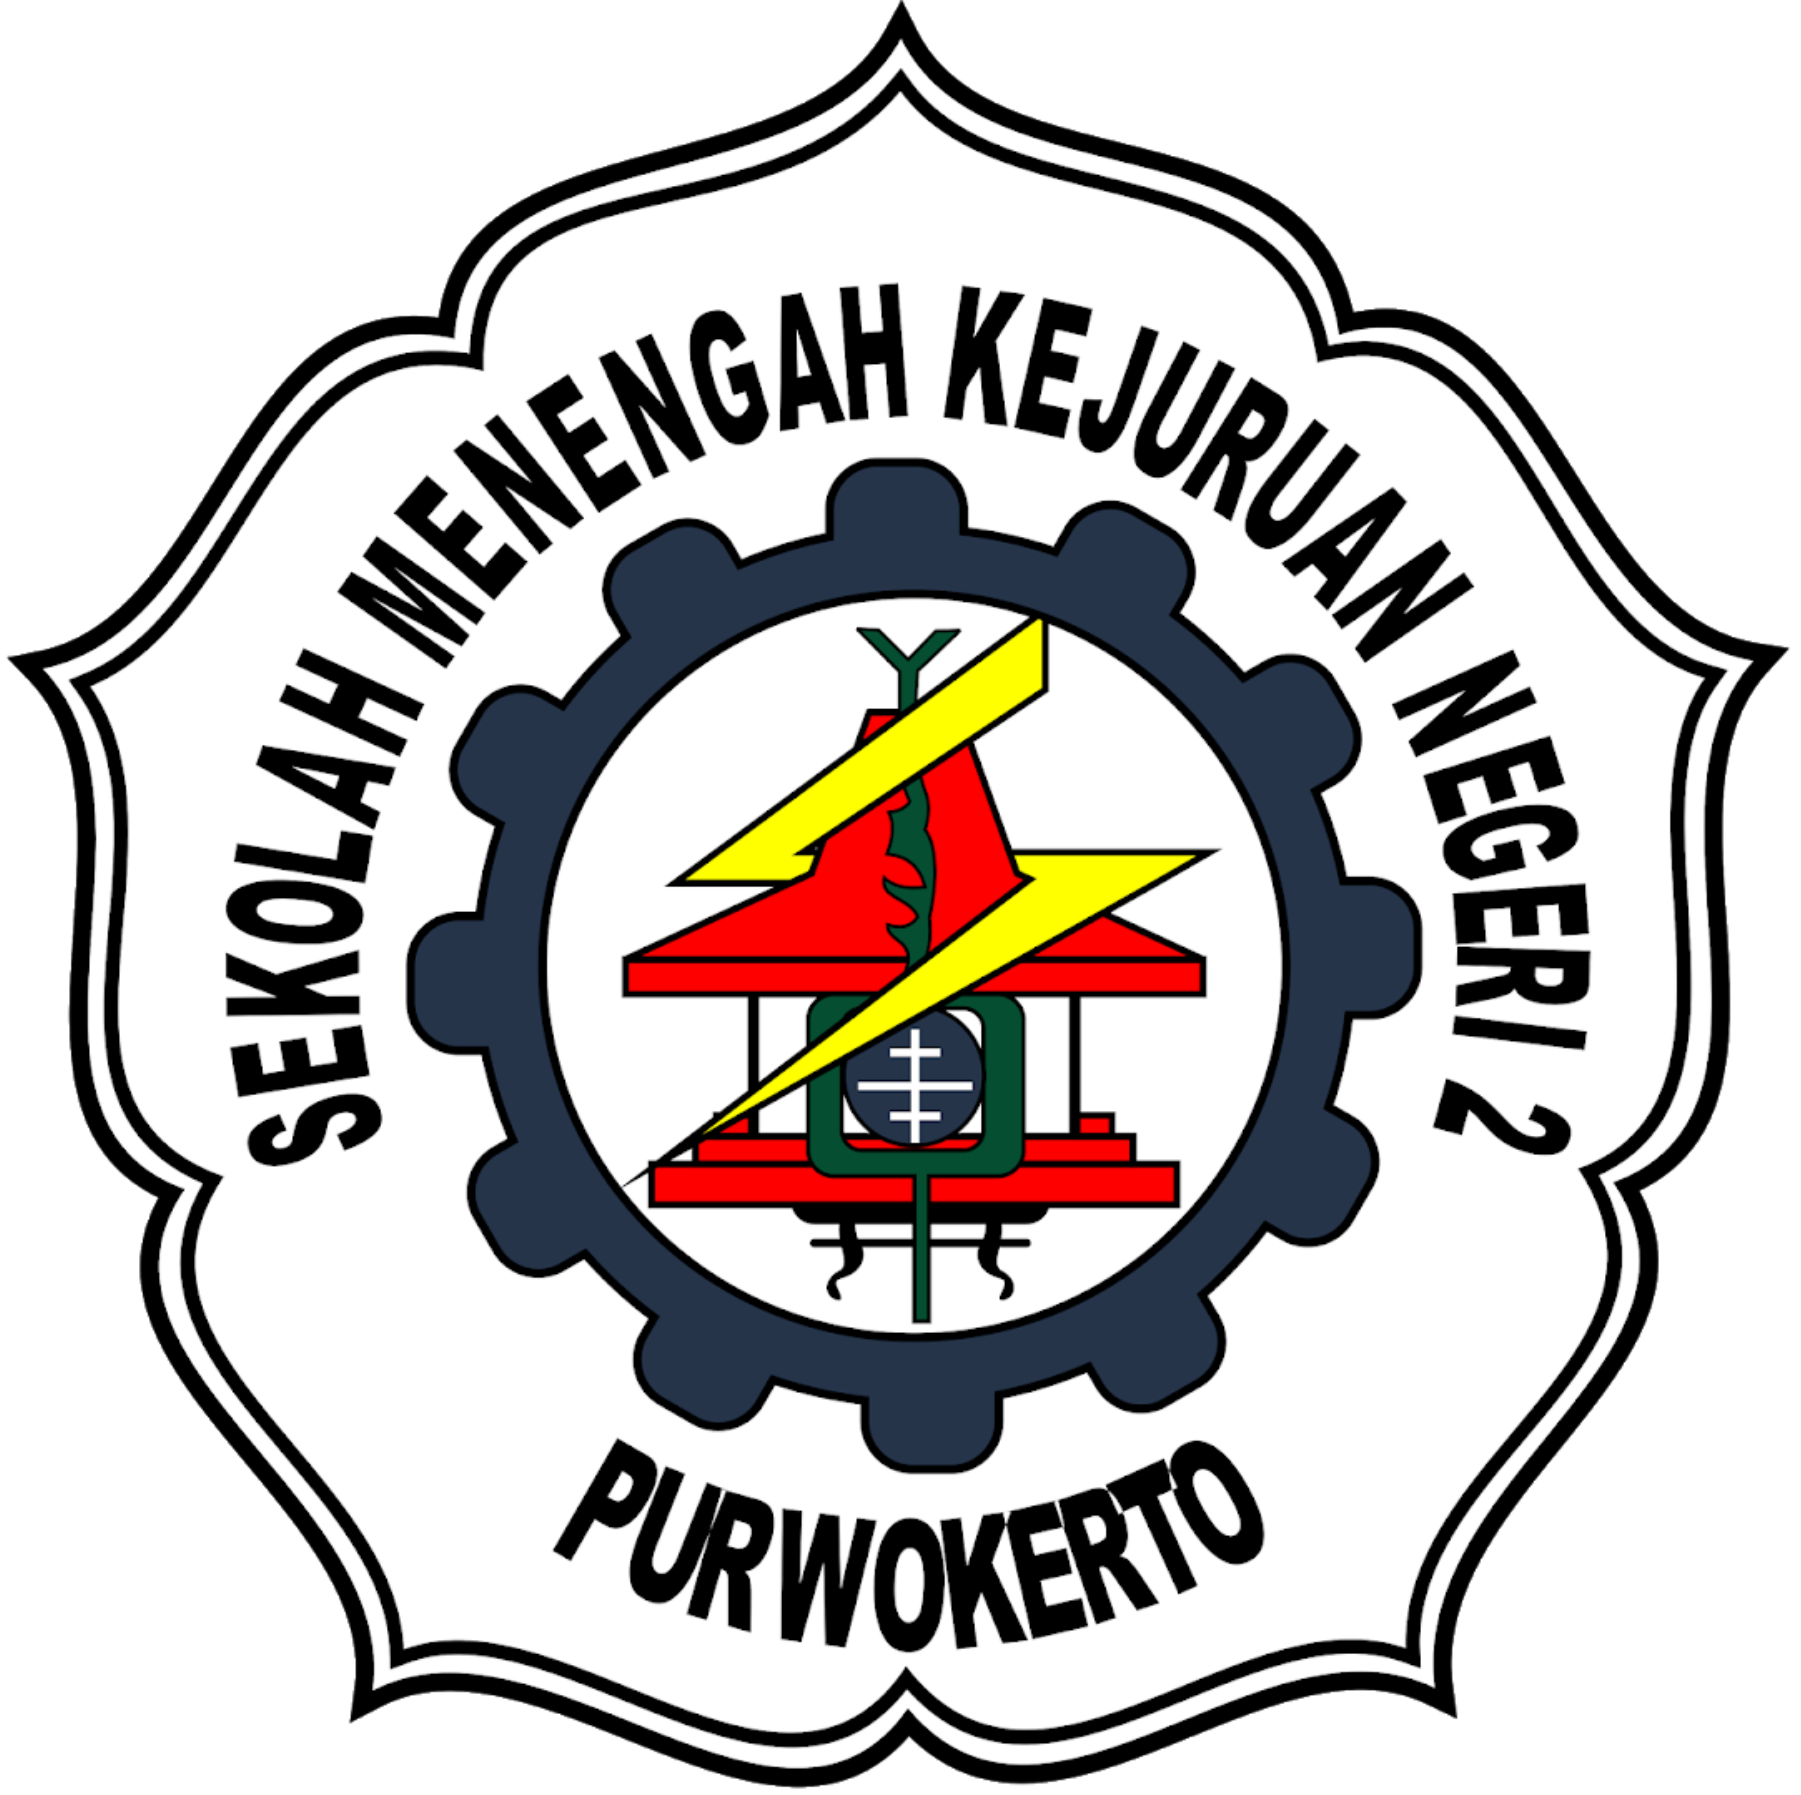 SMKN 2 Purwokerto